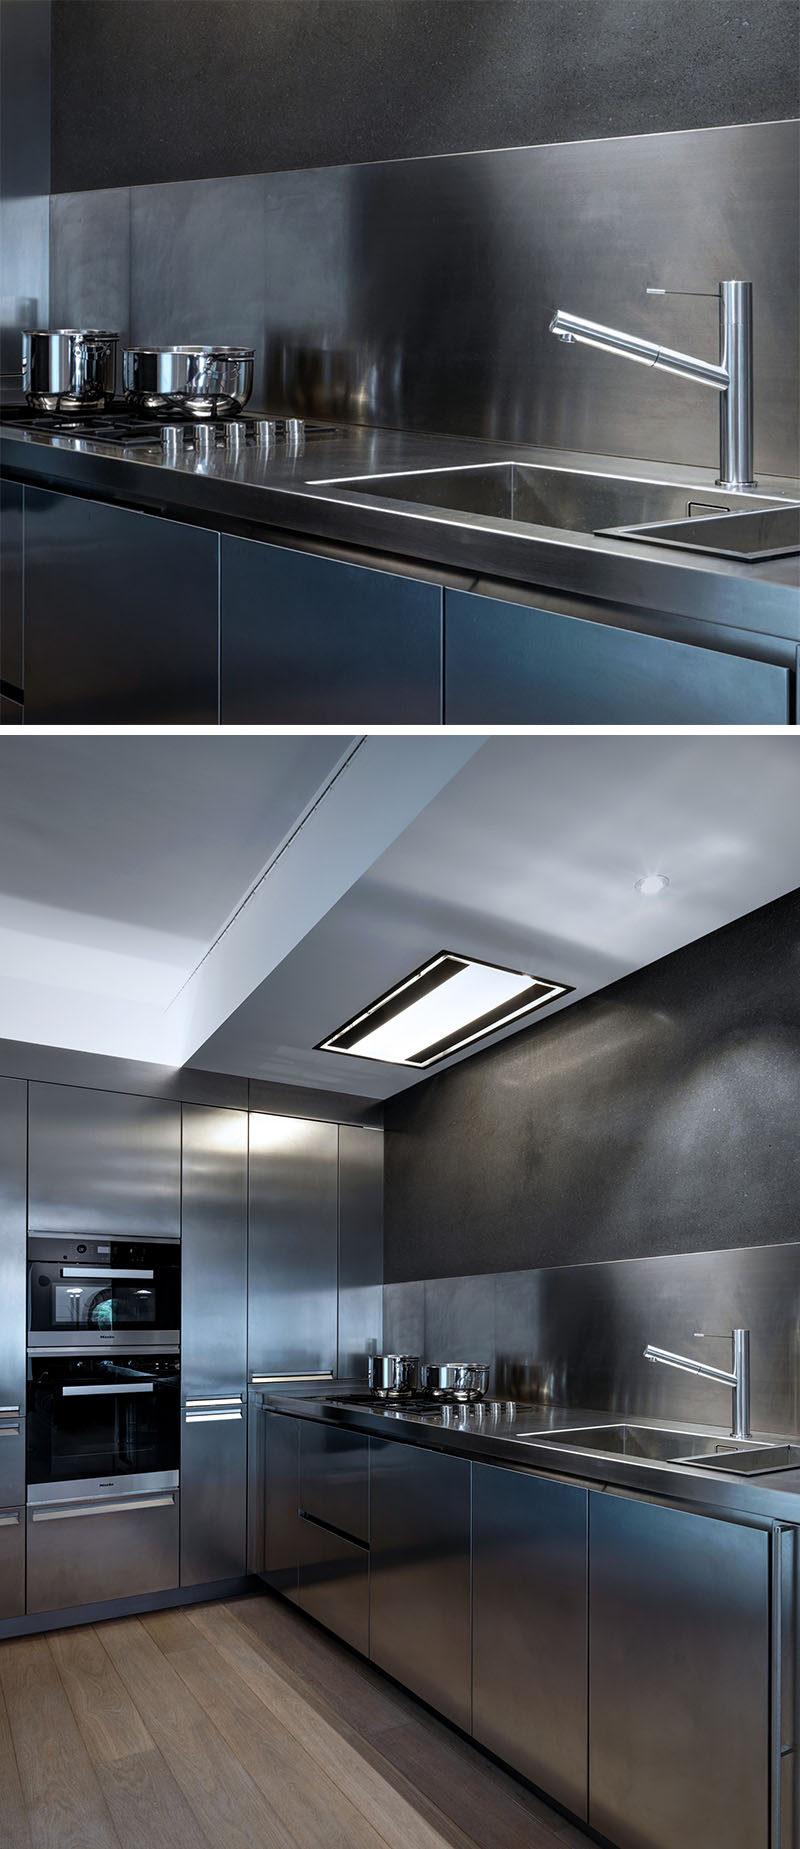 Kitchen Design Idea - Stainless Steel Backsplash // Everything in this kitchen is stainless steel, including the countertops and backsplash.